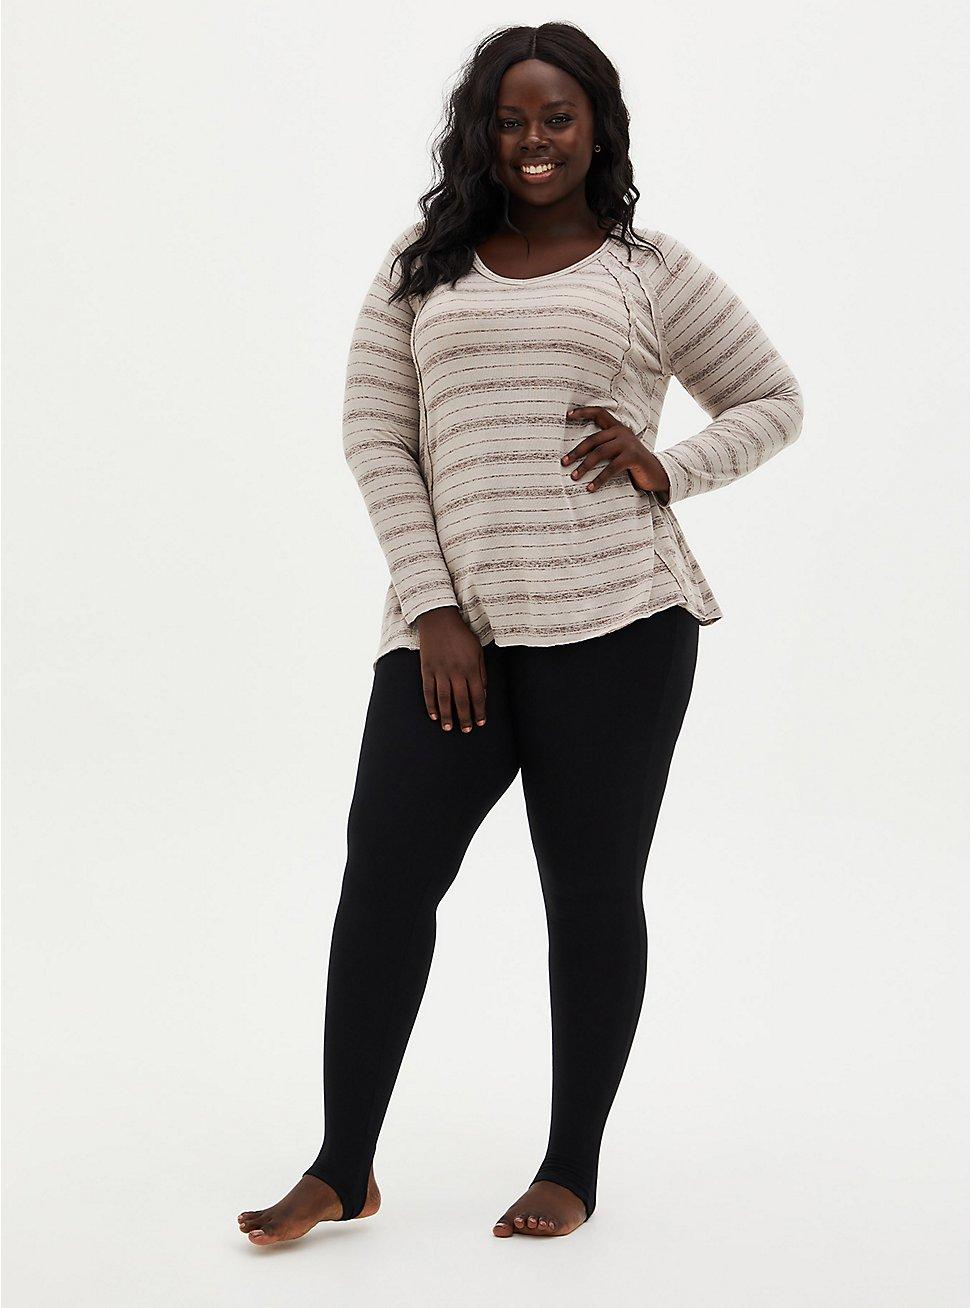 Platinum Stirrup Leggings - Fleece Lined Black  , BLACK, hi-res